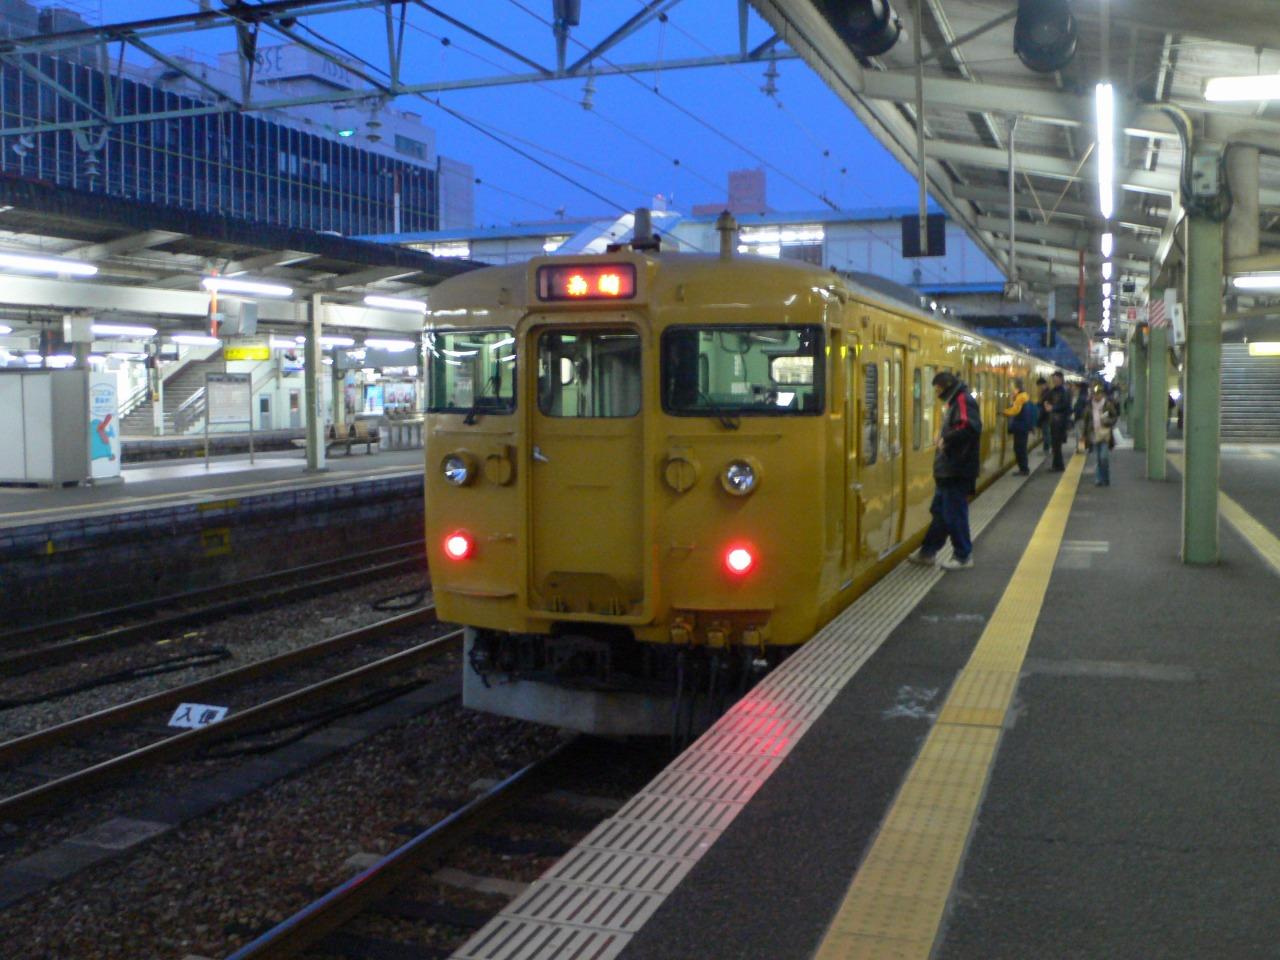 P1050845.jpg